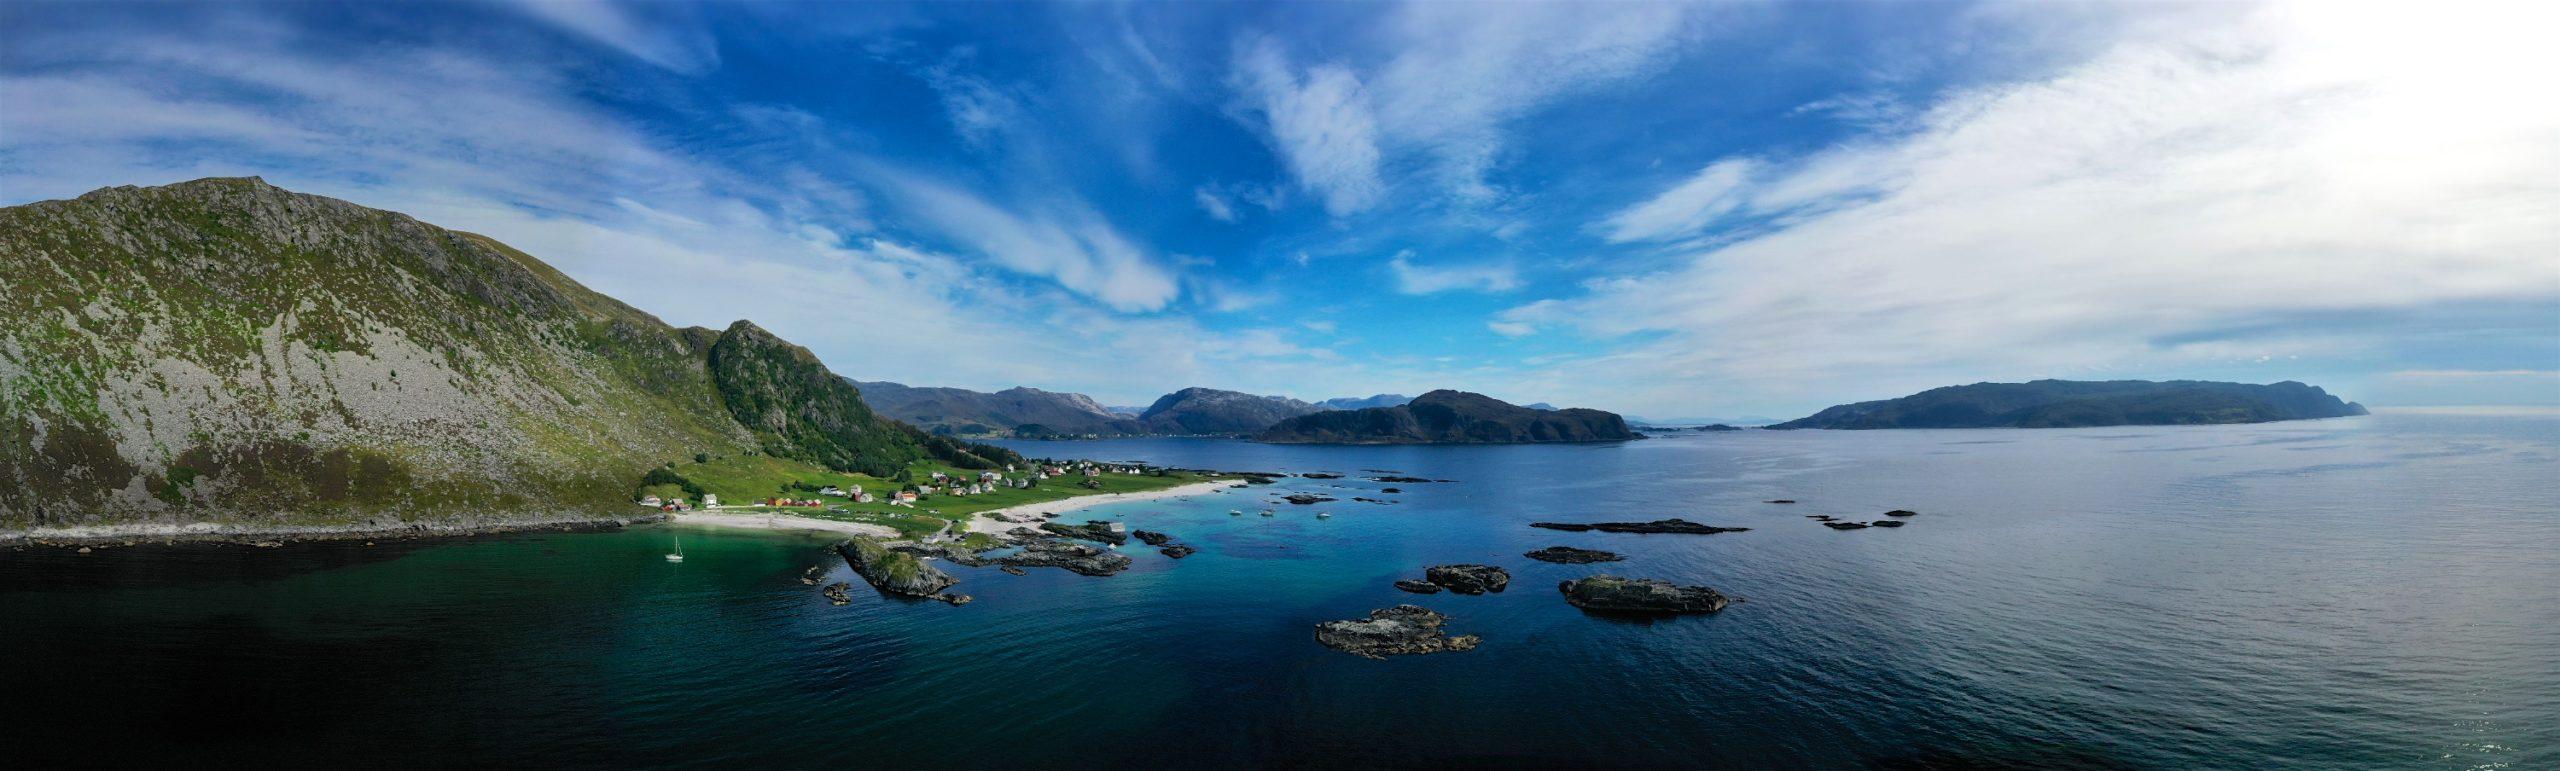 FJORDS NORWAY - Panorama Picture of Grotlesanden at Bremangerlandet in Nordfjord, Norway